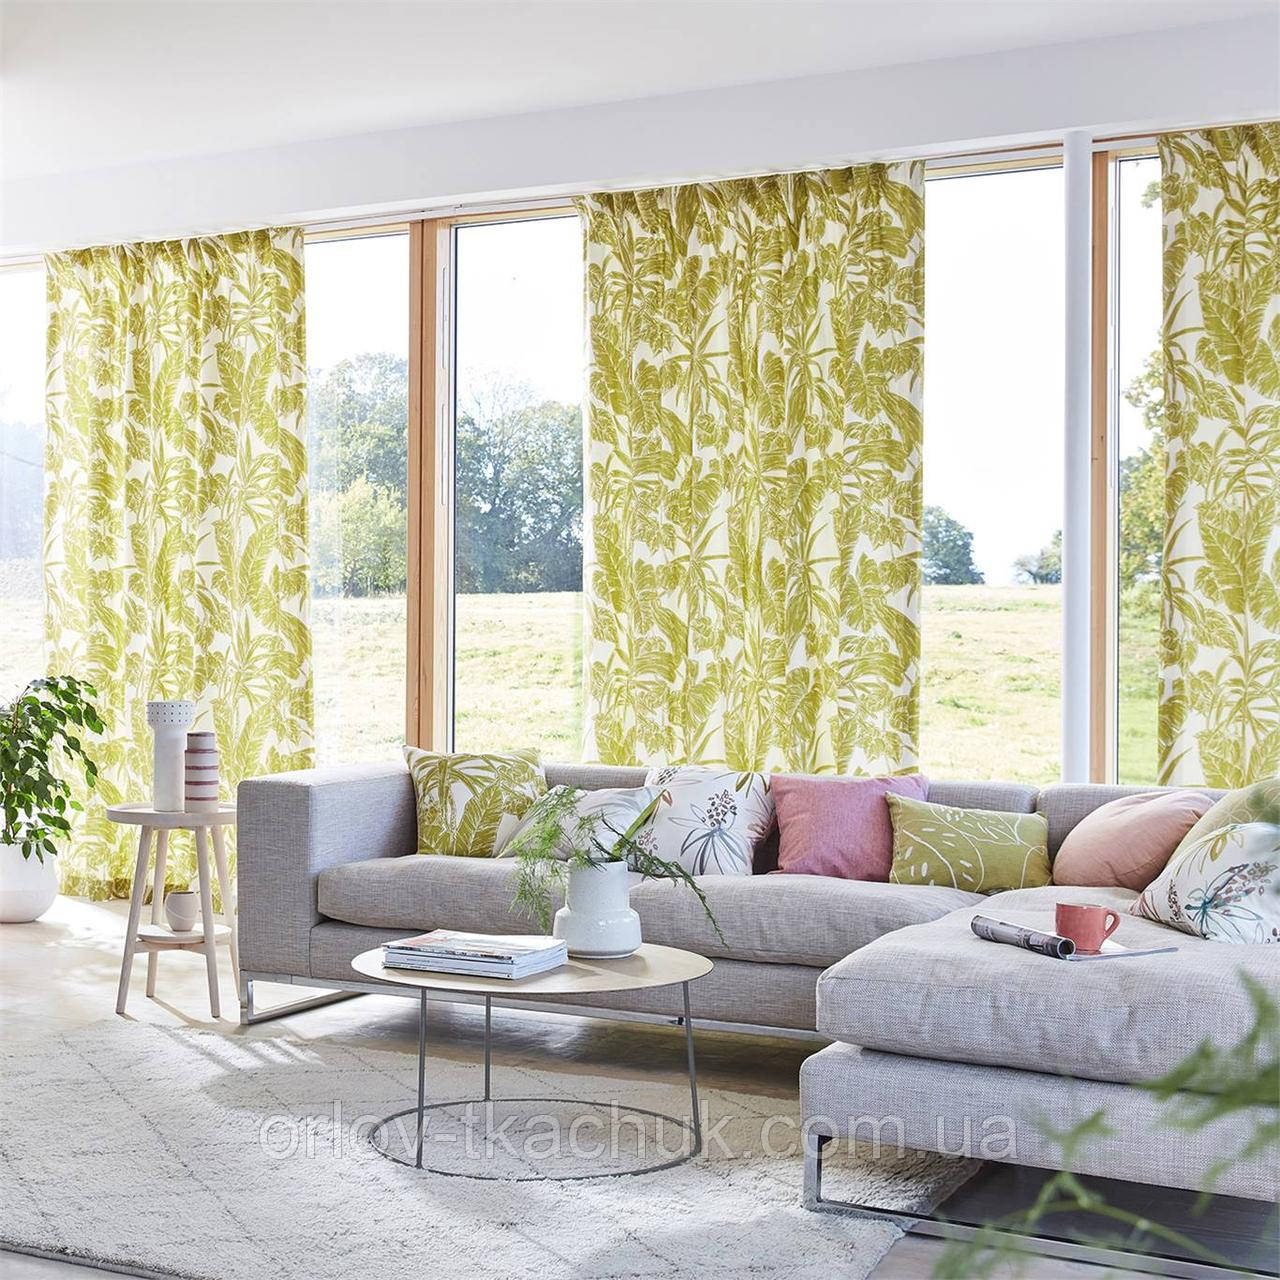 Ткань интерьерная Parlour Palm Zanzibar Fabrics Scion